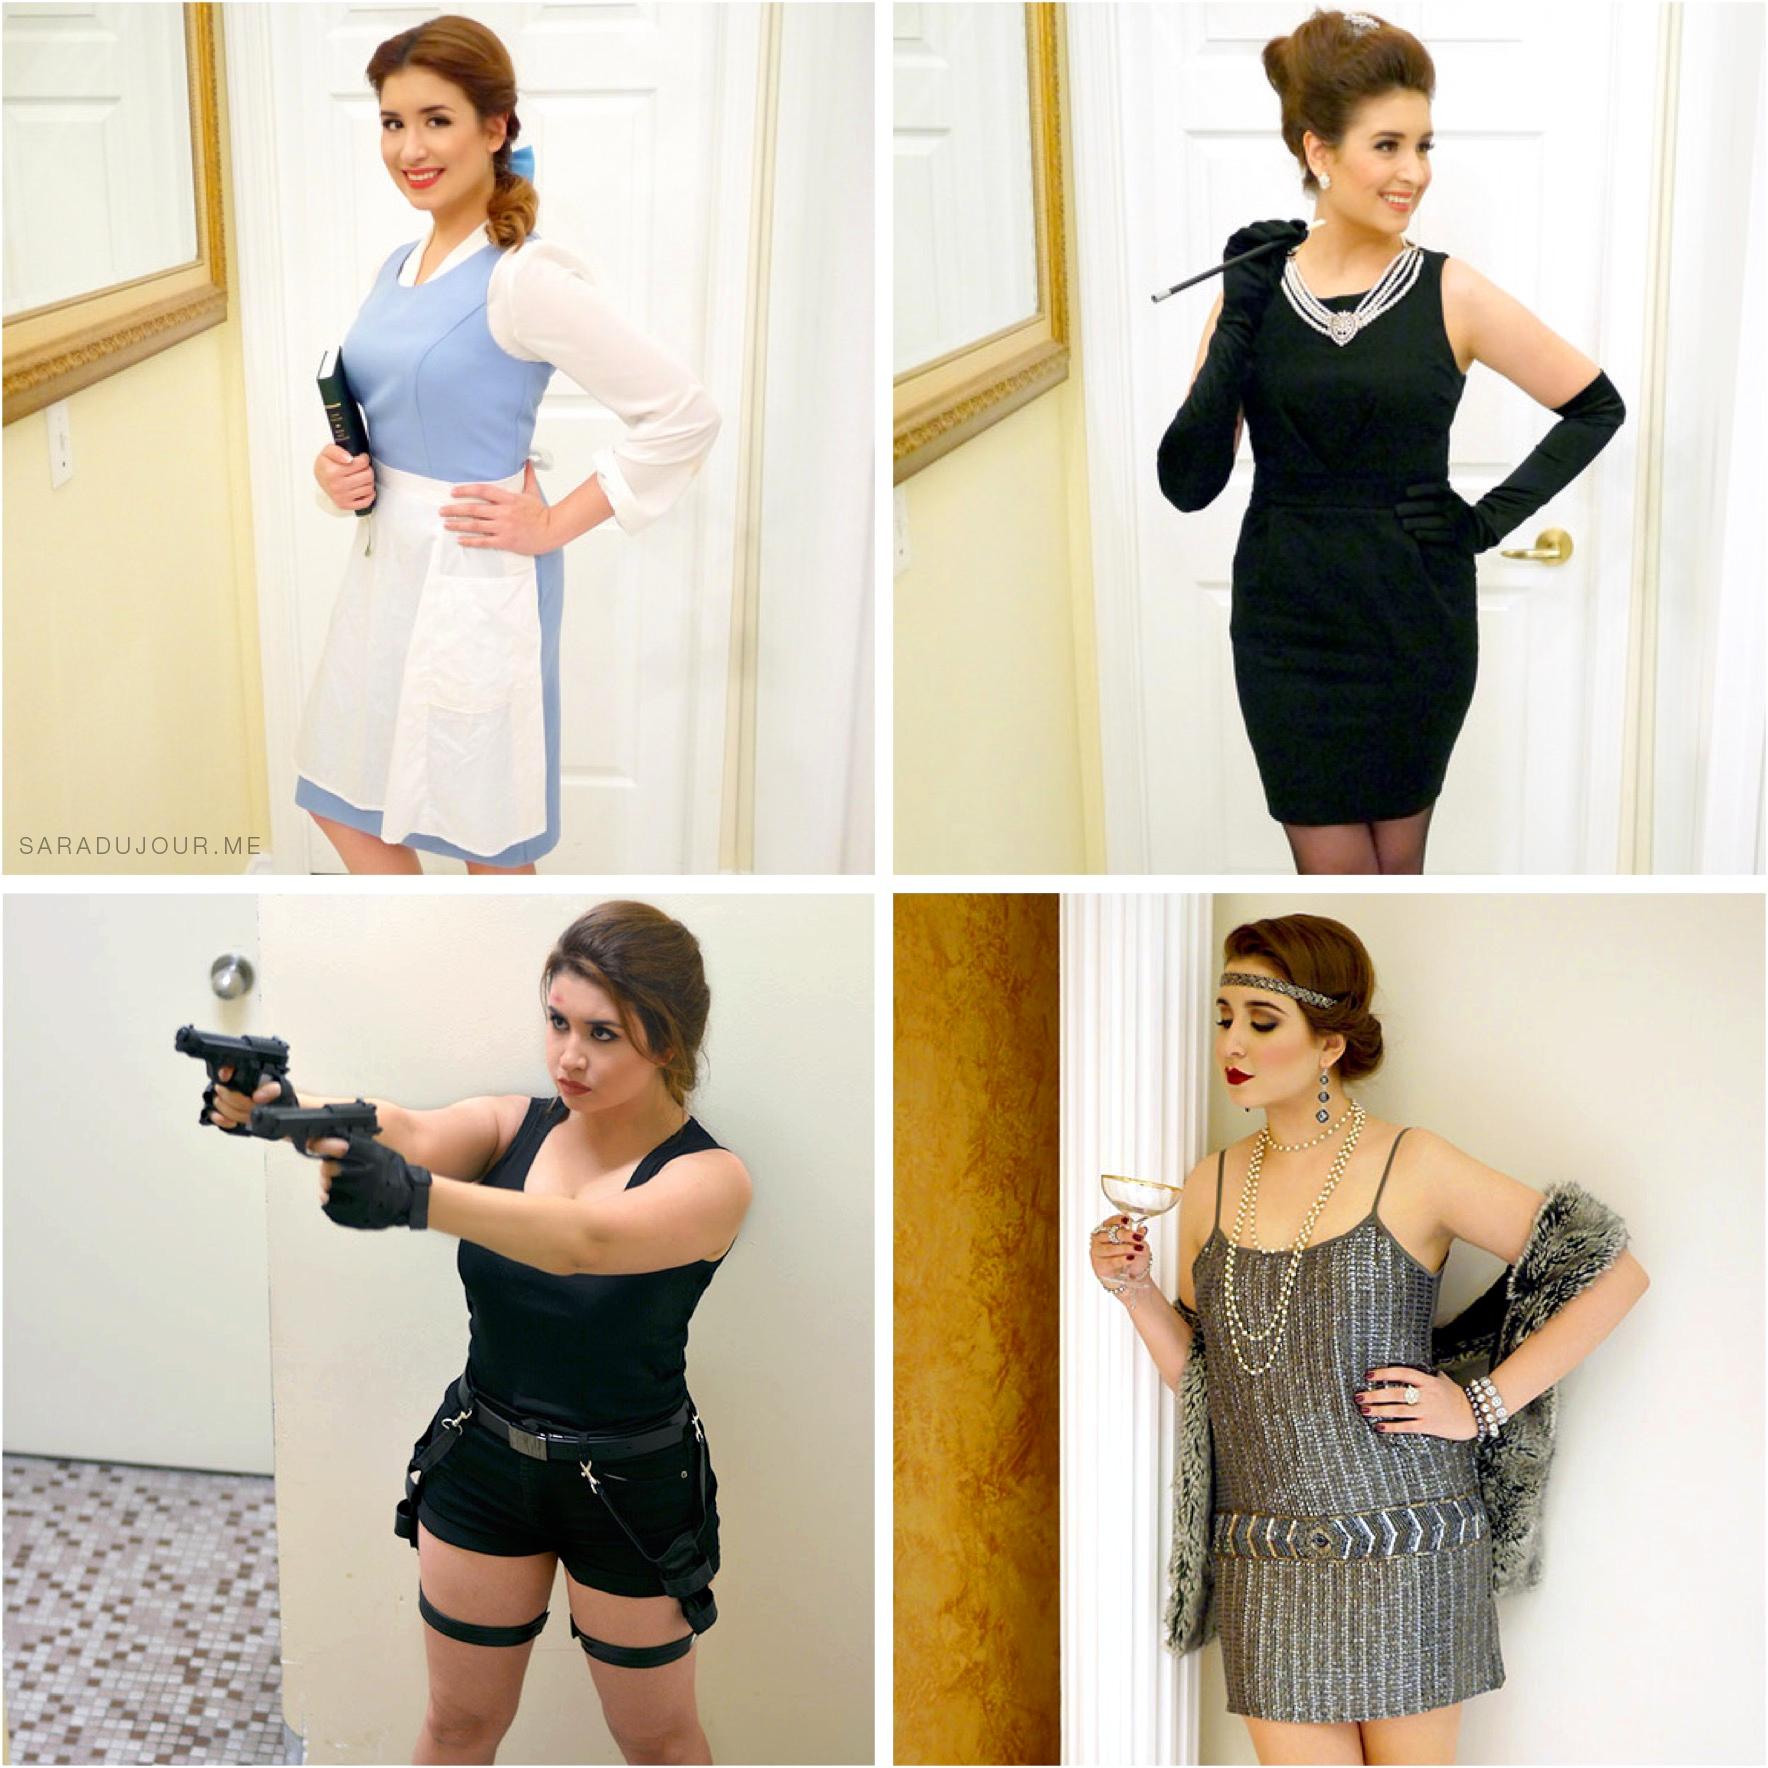 10 Amazing Do It Yourself Costume Ideas 4 easy halloween costume ideas e280a2 sara du jour 3 2020